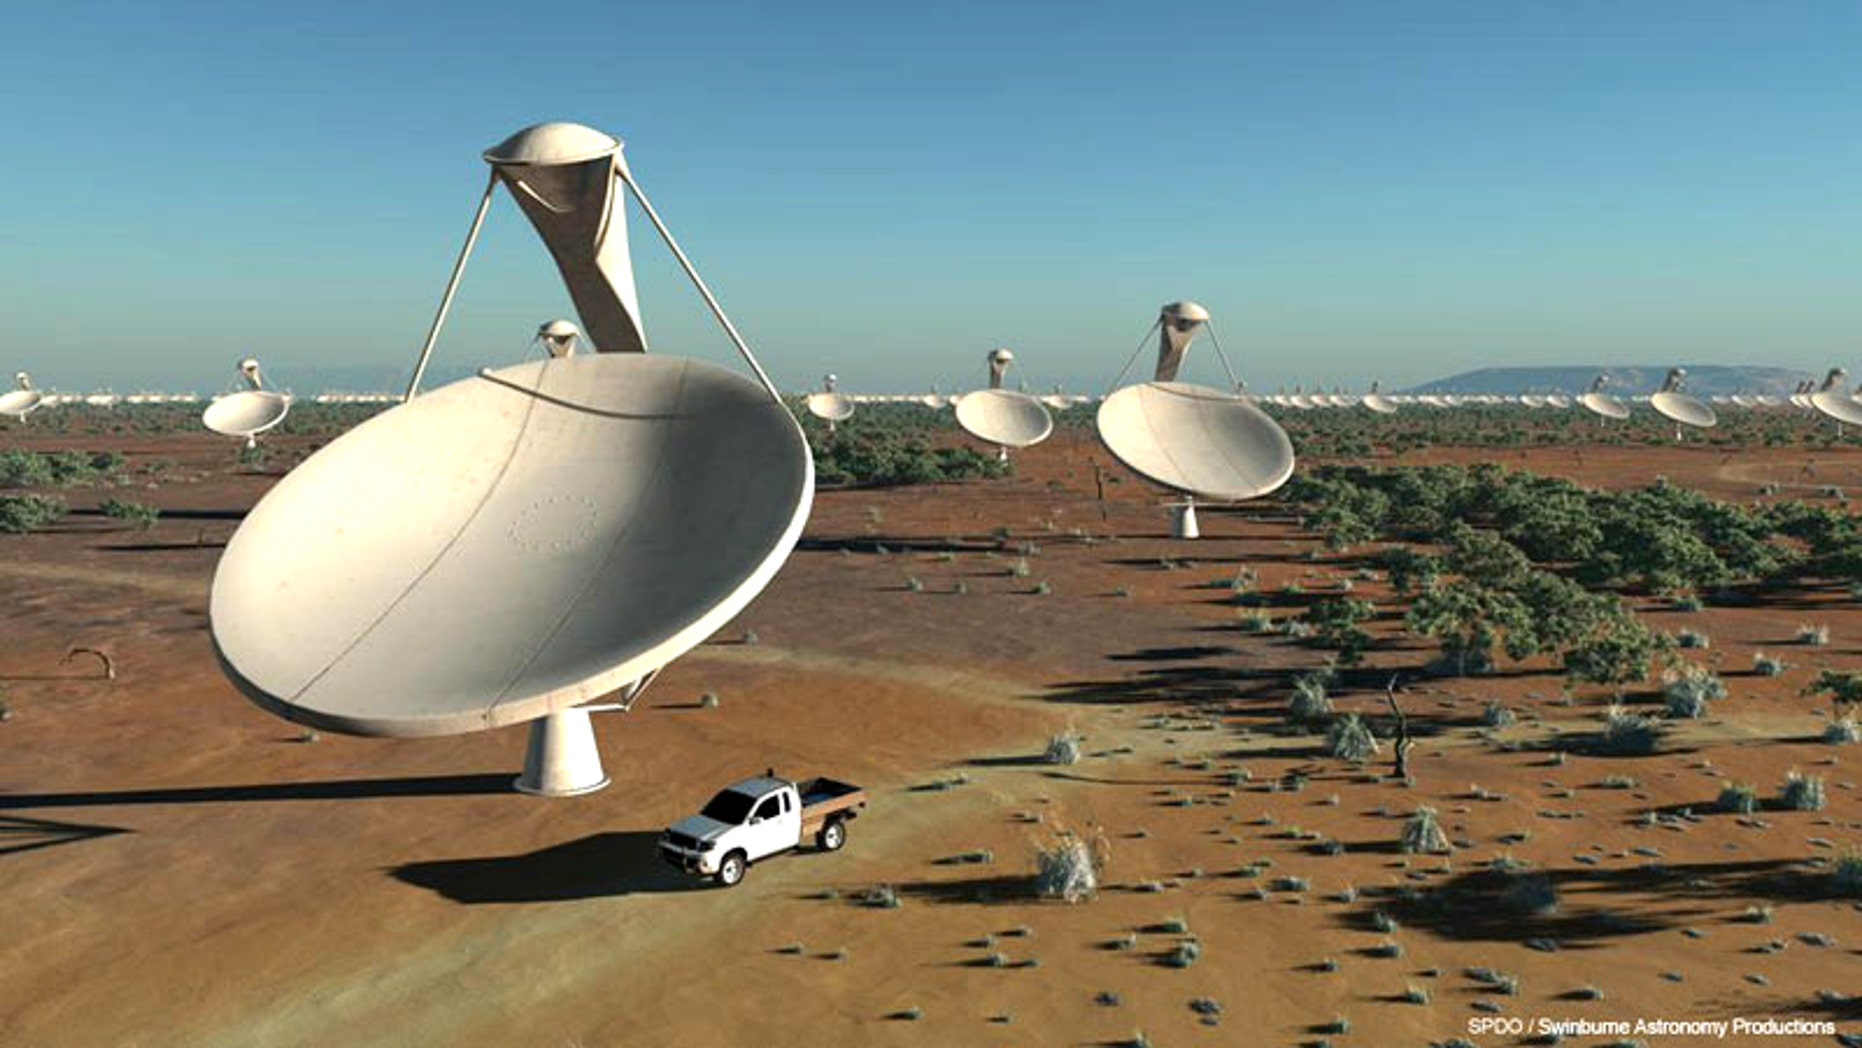 An artist's interpretation of the Square-Kilometer Array, a huge radio telescope currently under development in Australia.